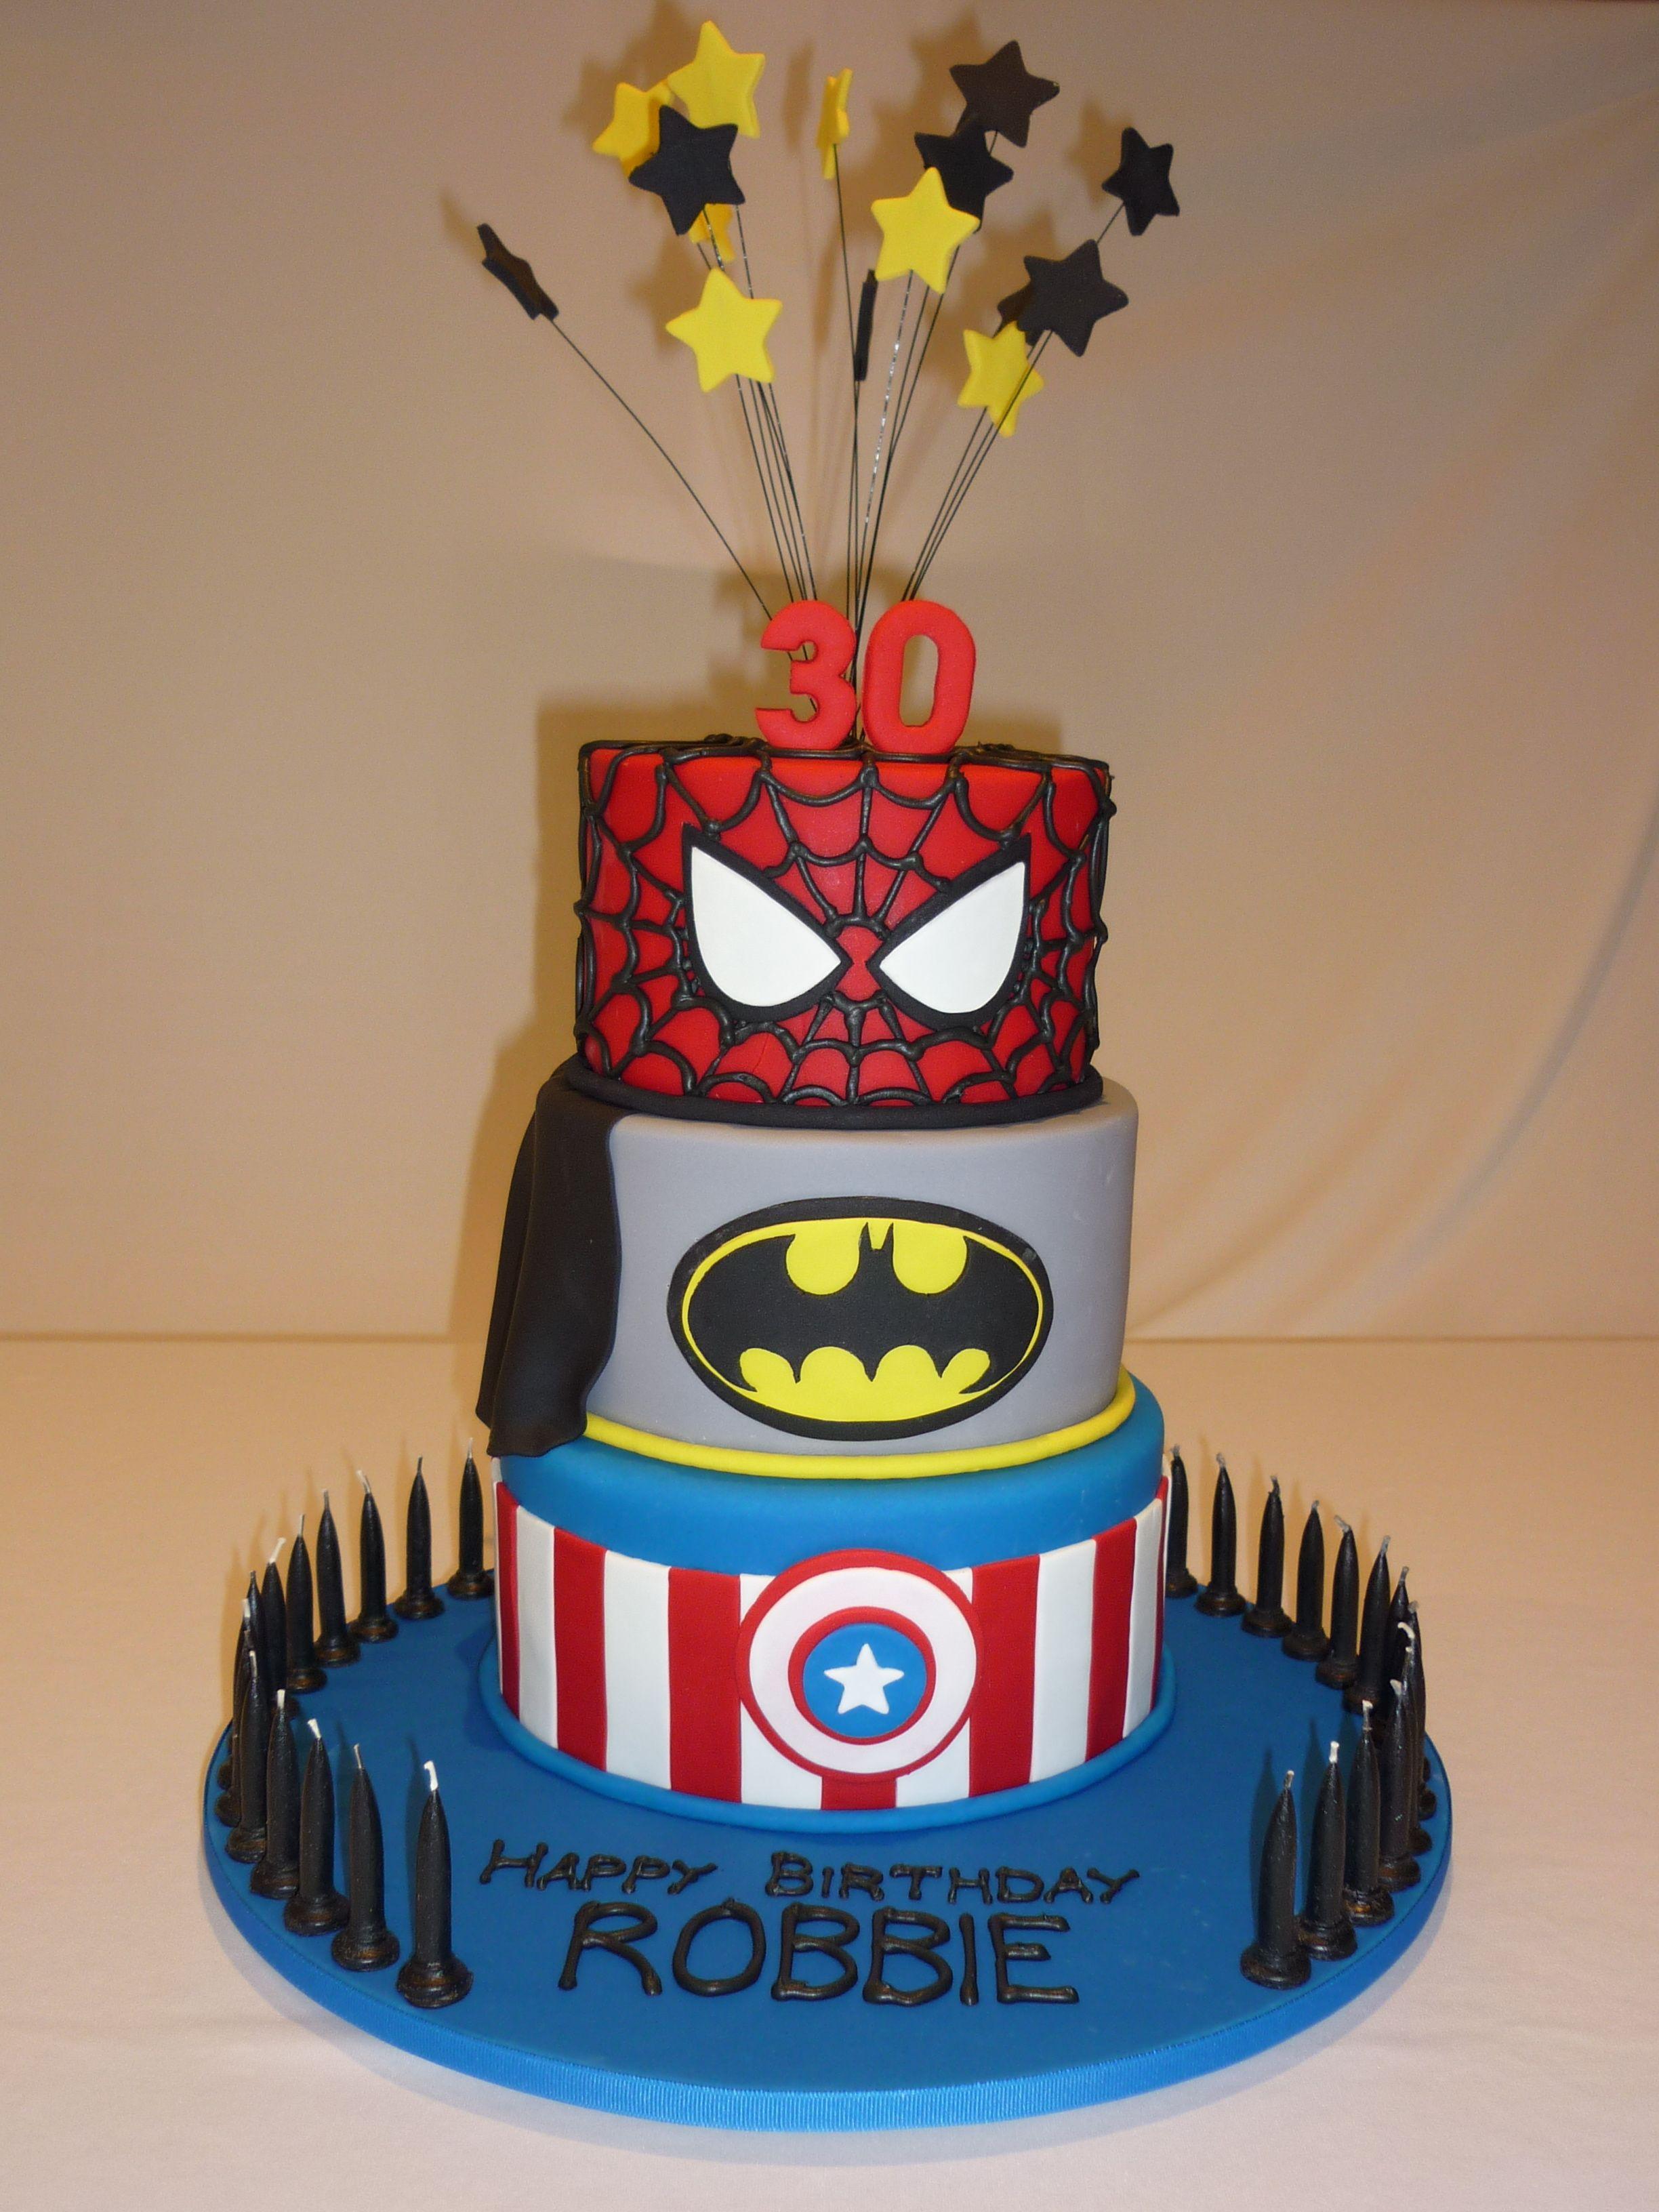 Spiderman Batman and Captain America Super Hero 30th birthday cake